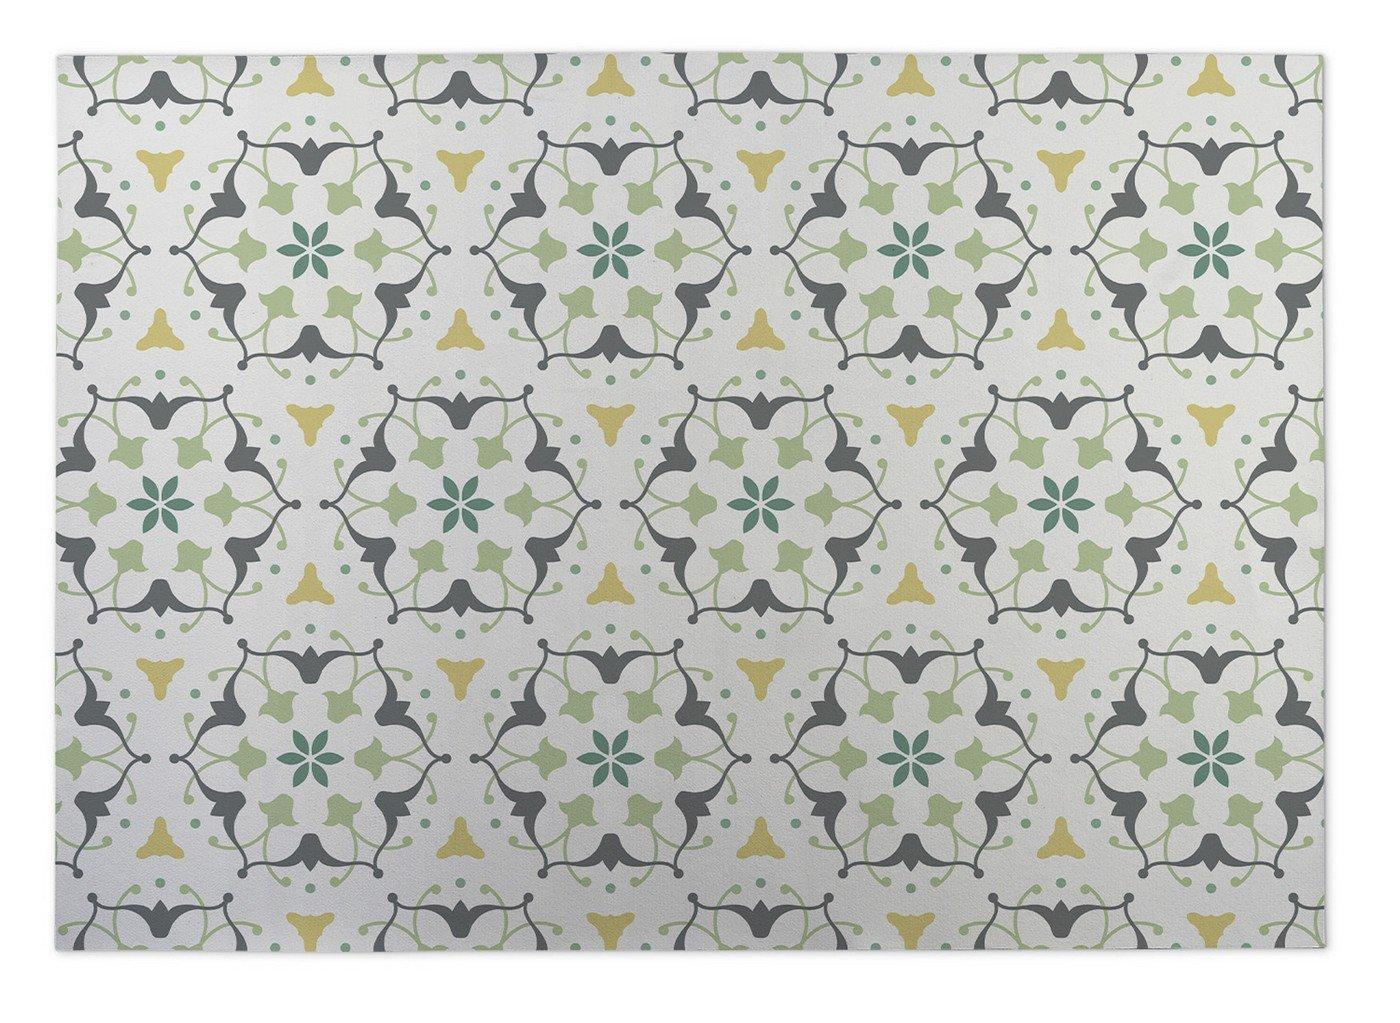 Ivory//Grey//Yellow//Green KAVKA Designs Kaleidoscope Indoor-Outdoor Floor Mat, Size: 24x36x0.2 - MGTAVC078FM23 -